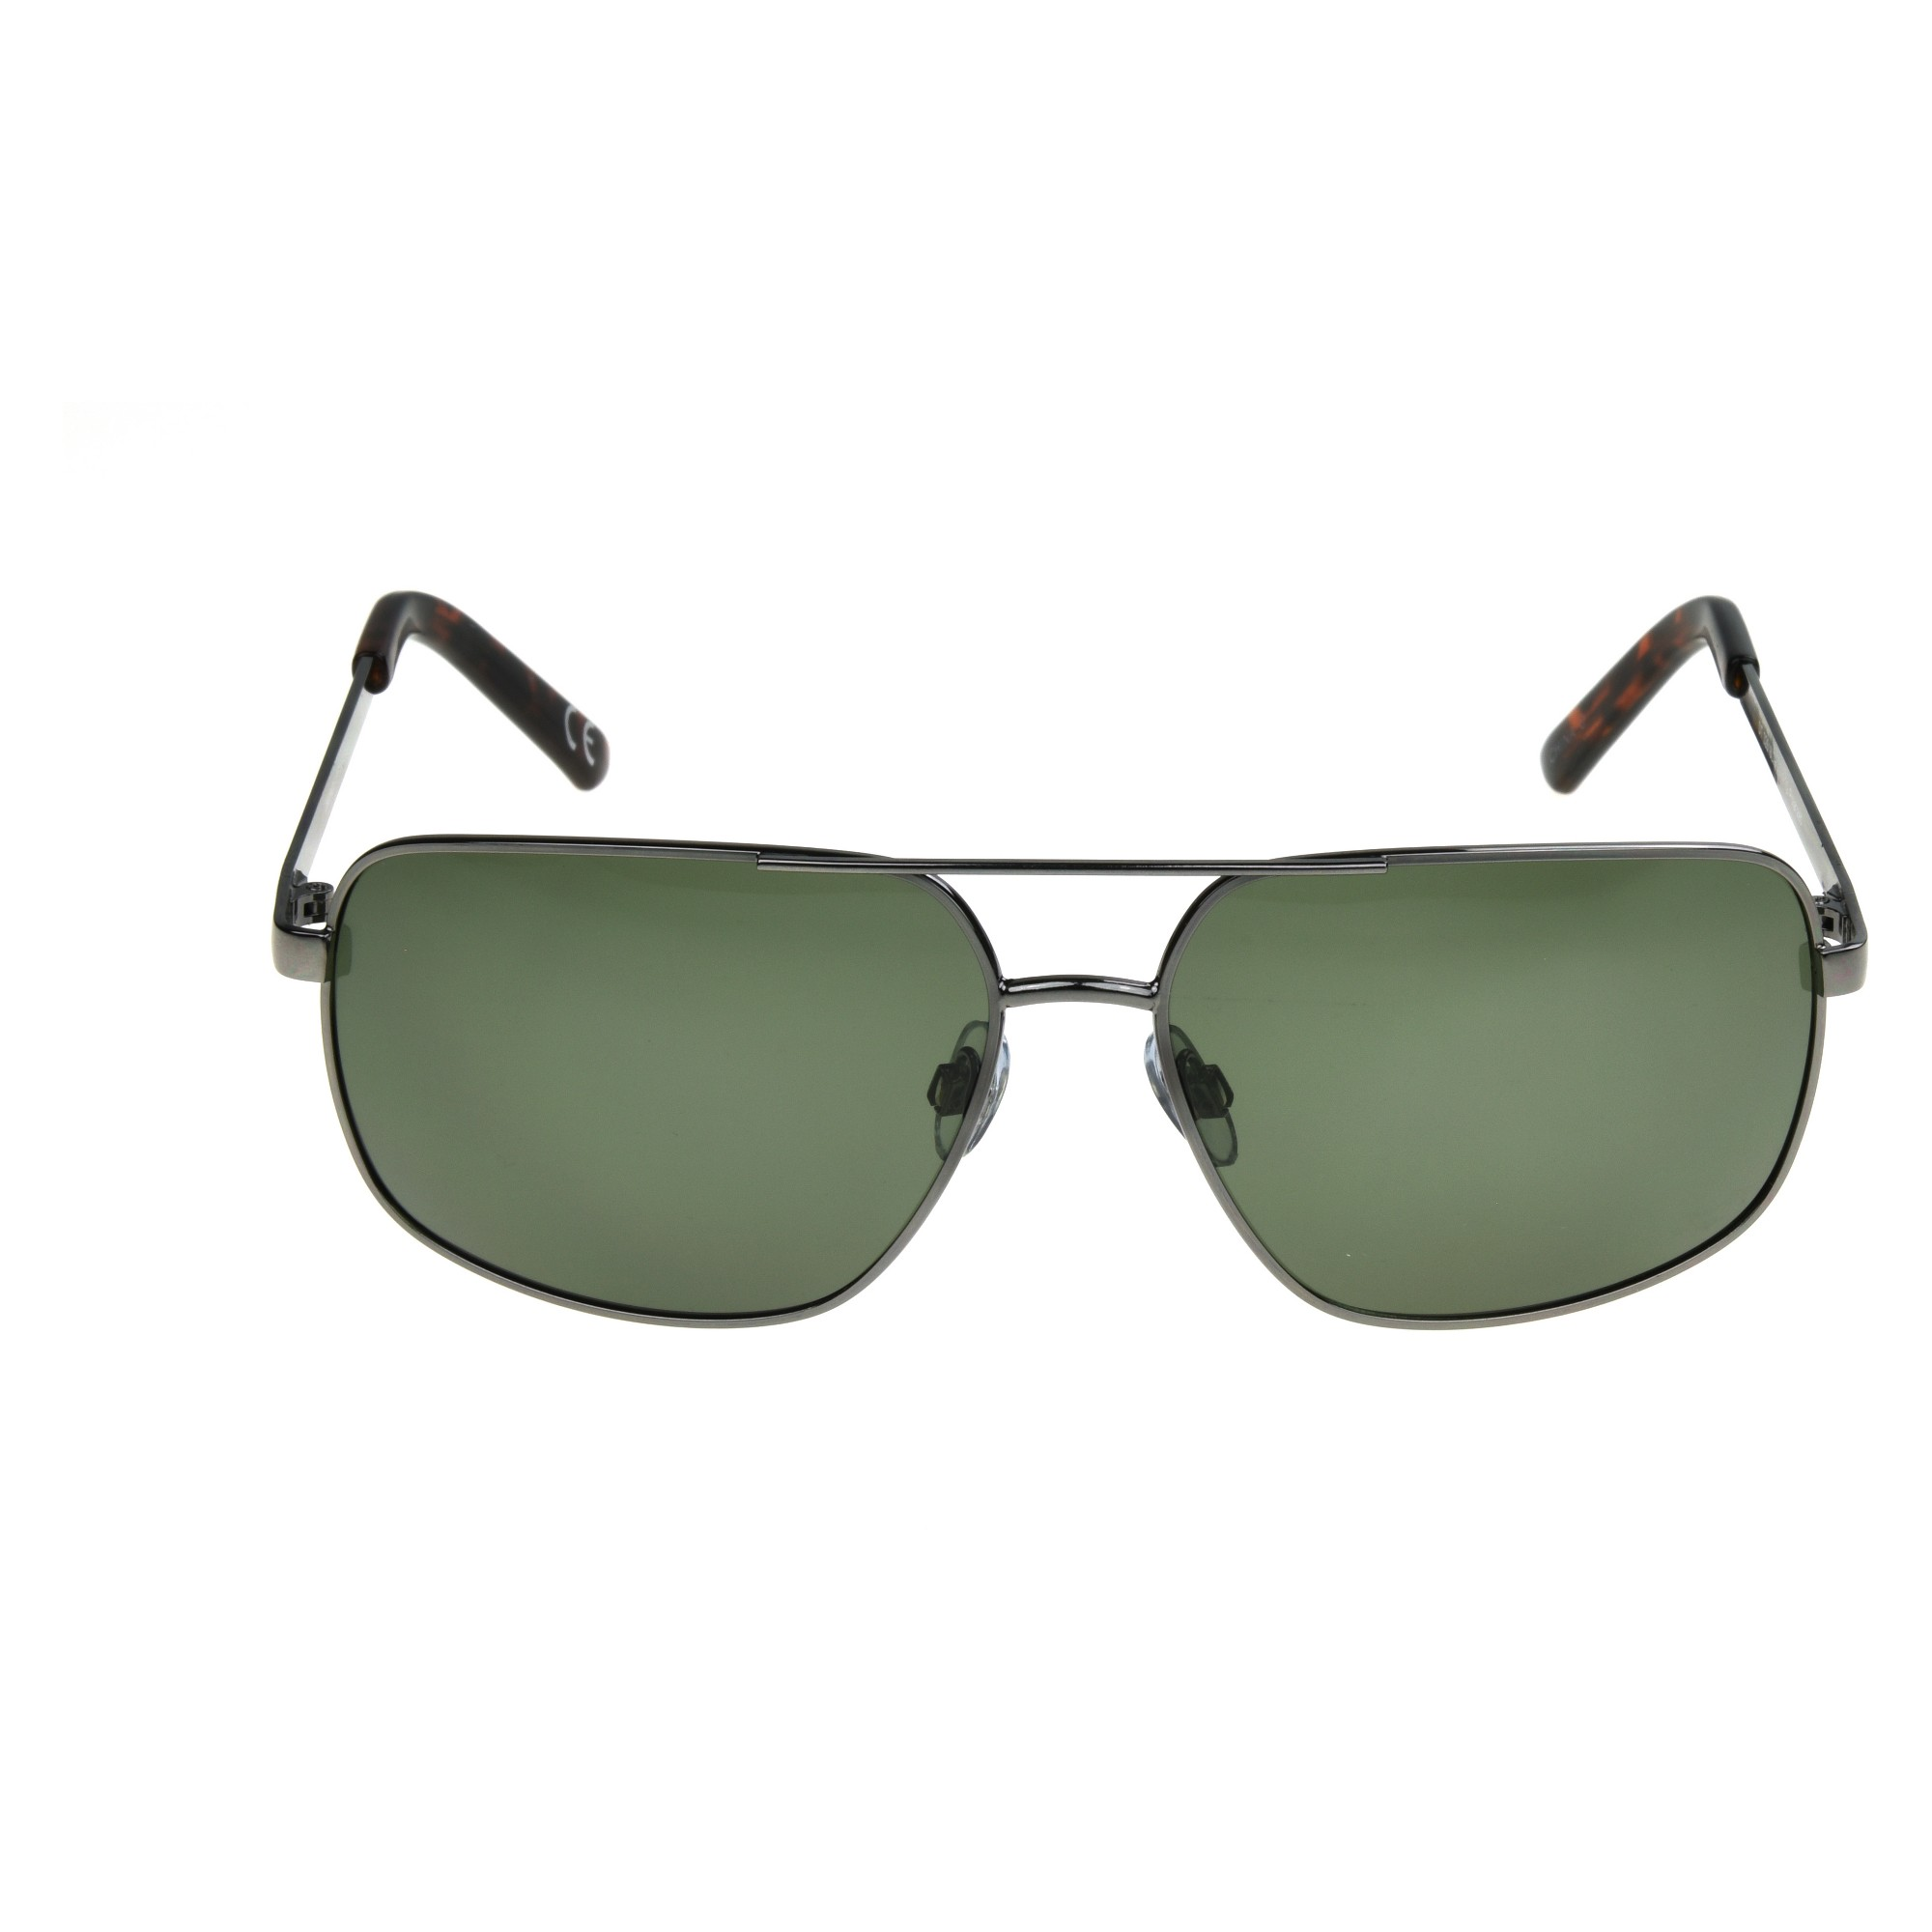 59e32c8e339e3 Men s Polarized Navigator Sunglasses - Goodfellow   Co Silver